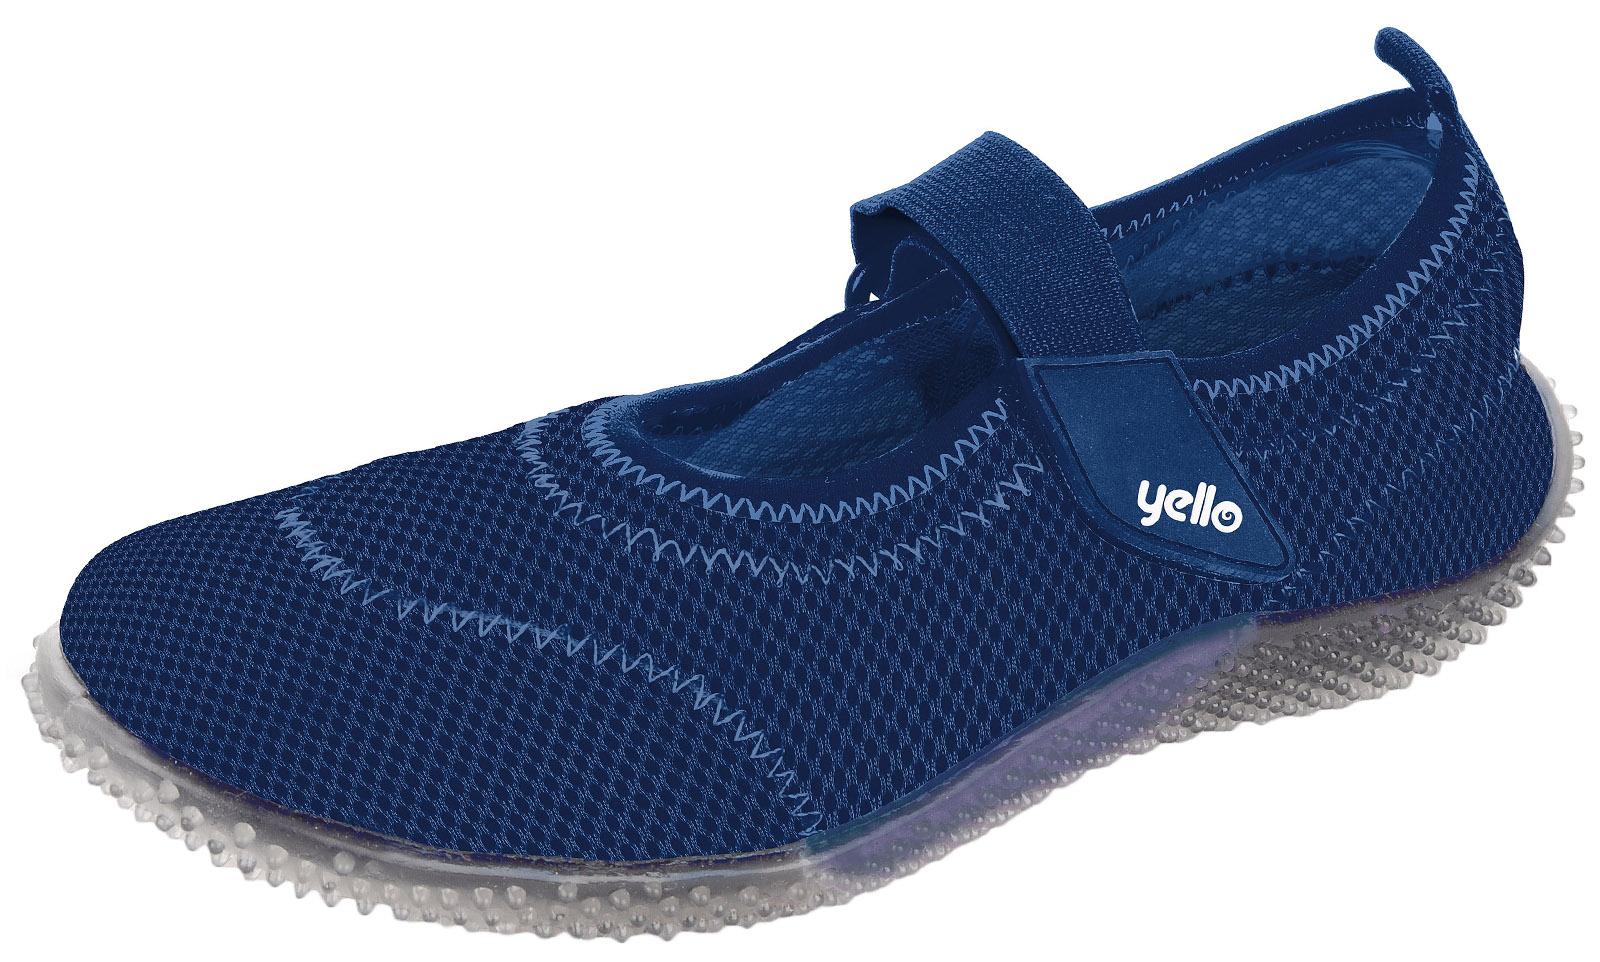 Womens aqua socks beach water shoes adjustable sandals pool yoga girls ladies ebay - Calze per piscina ...